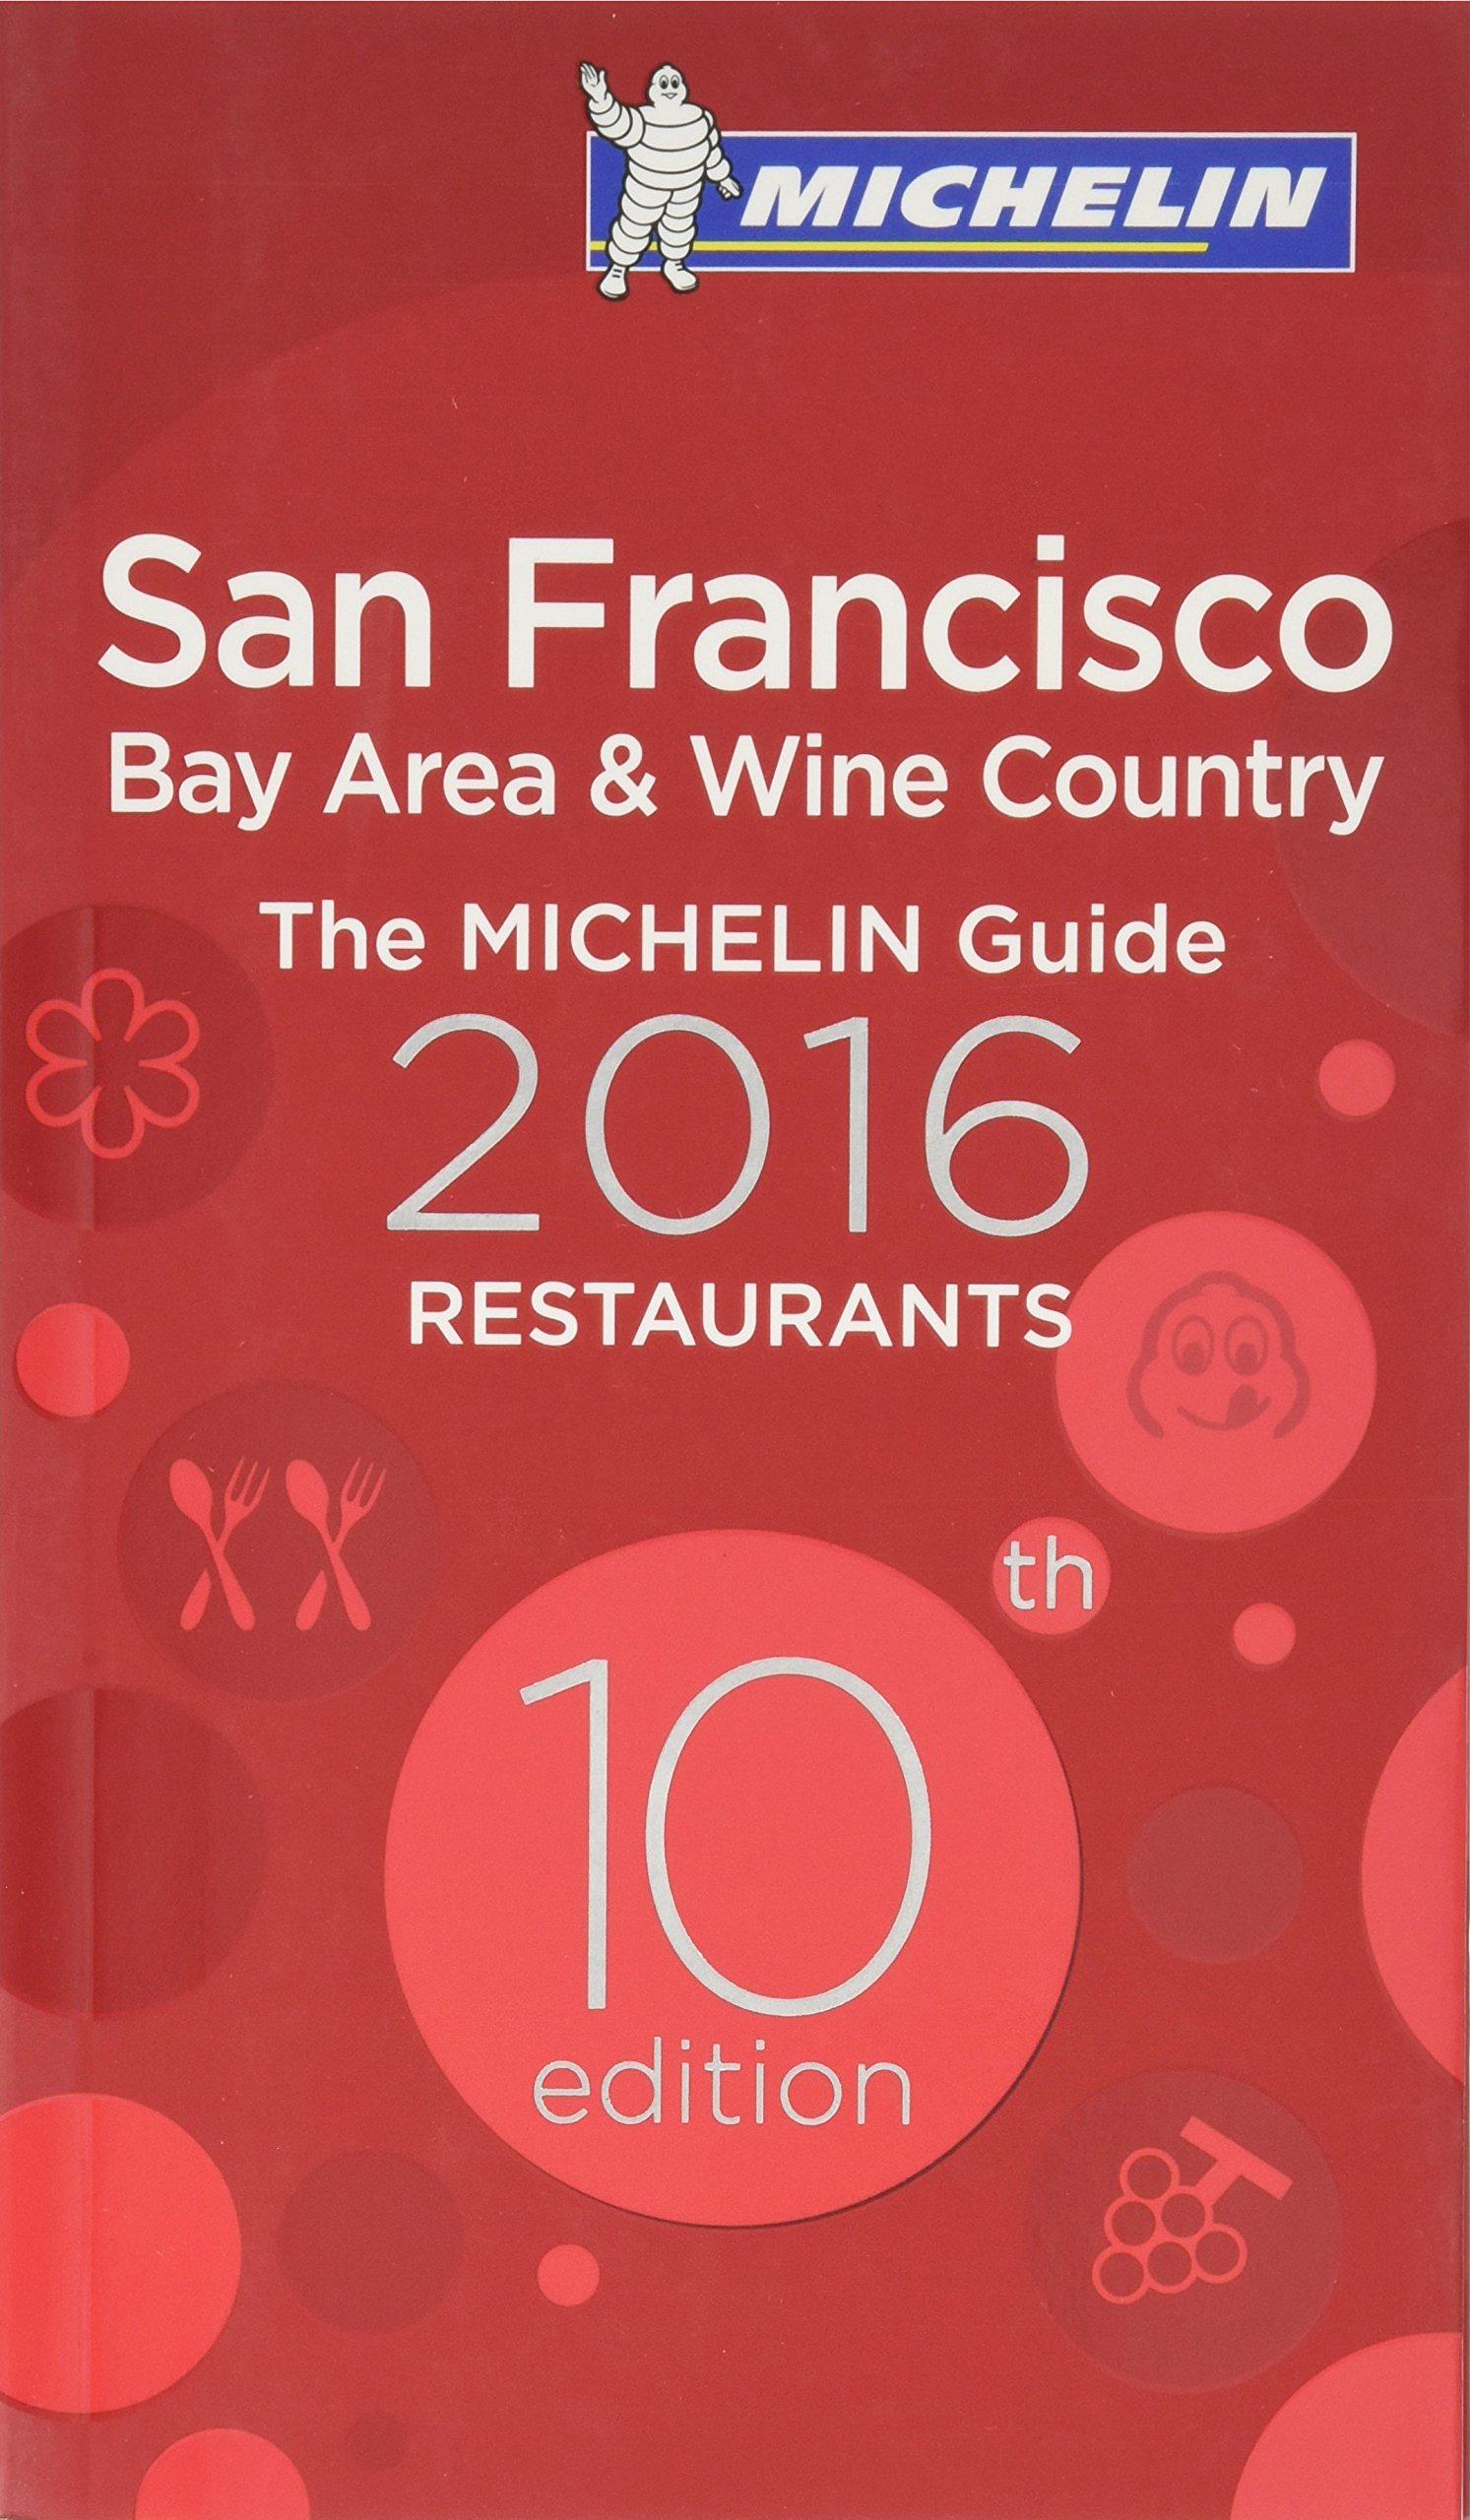 Download MICHELIN Guide San Francisco 2016: Bay Area & Wine Country (Michelin Guide/Michelin) PDF